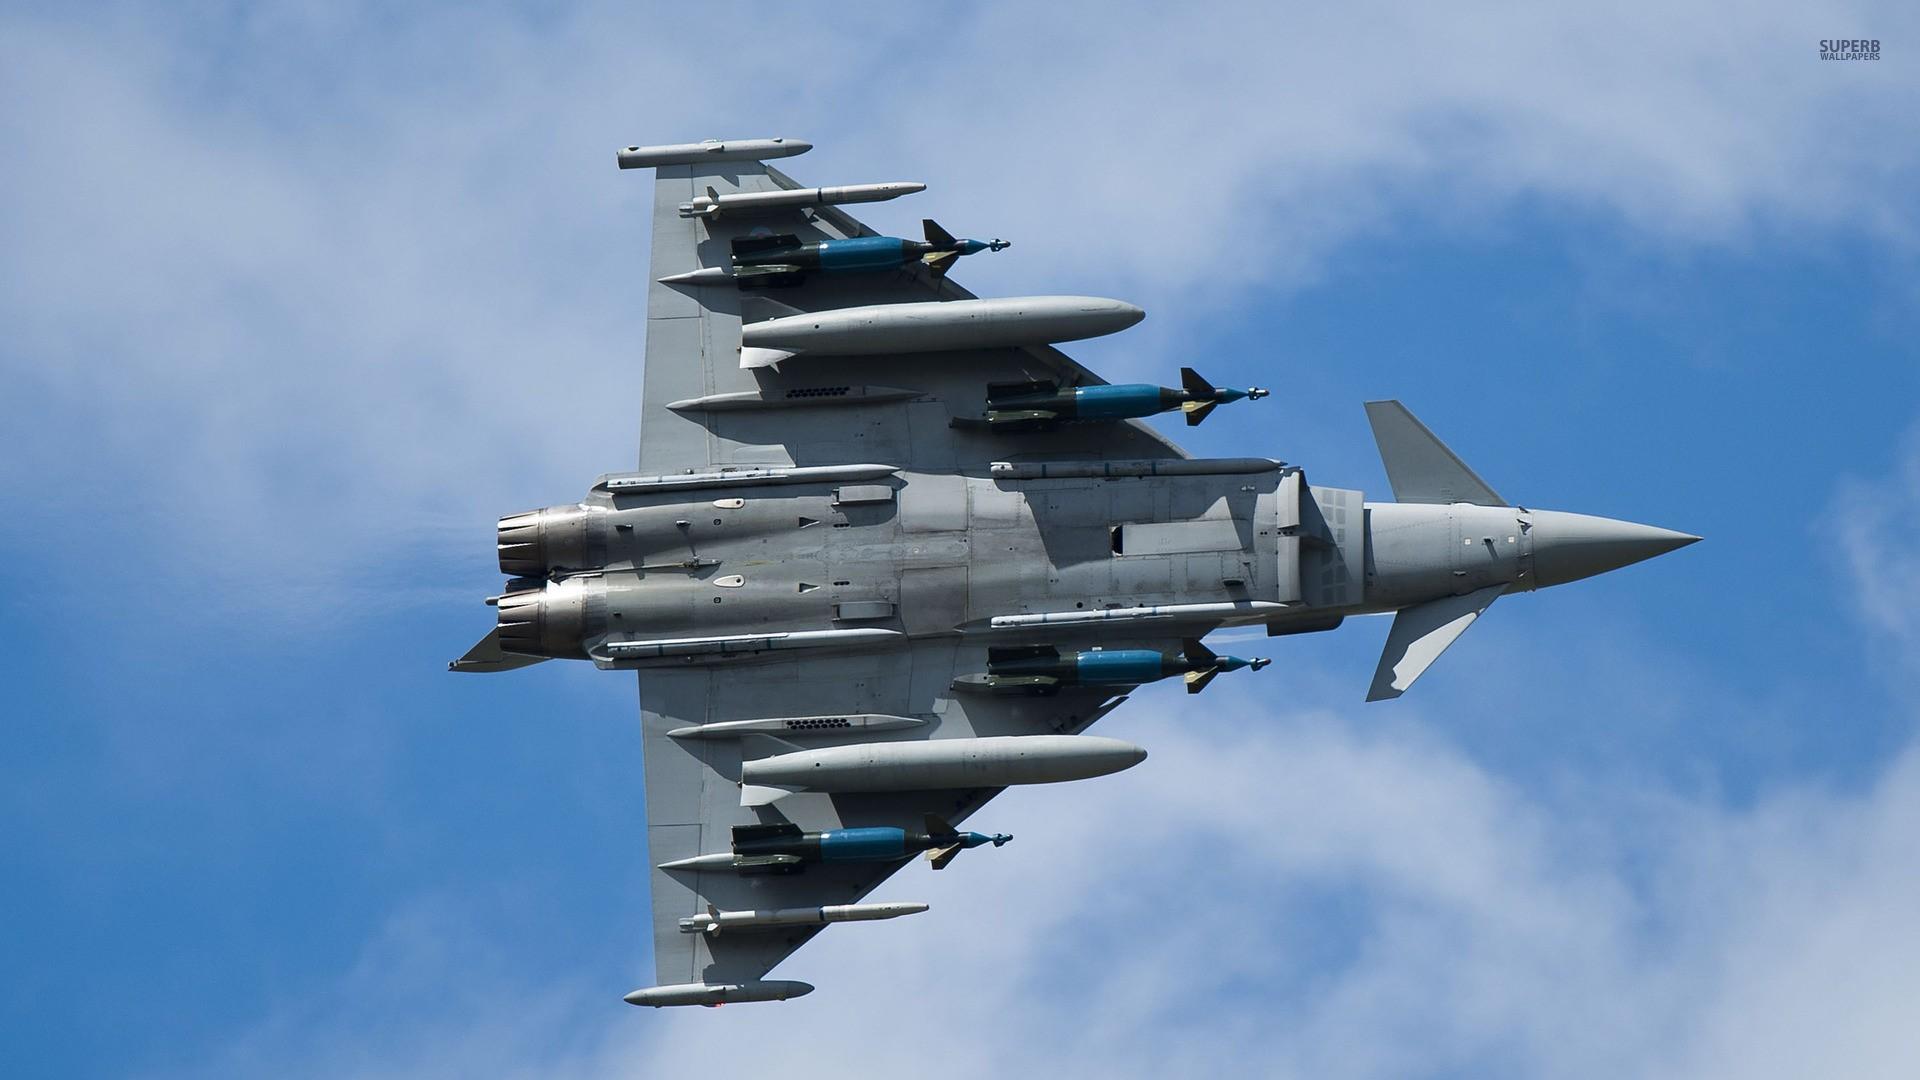 Fondos De Pantalla Vehículo Eurofighter Typhoon Aeronave